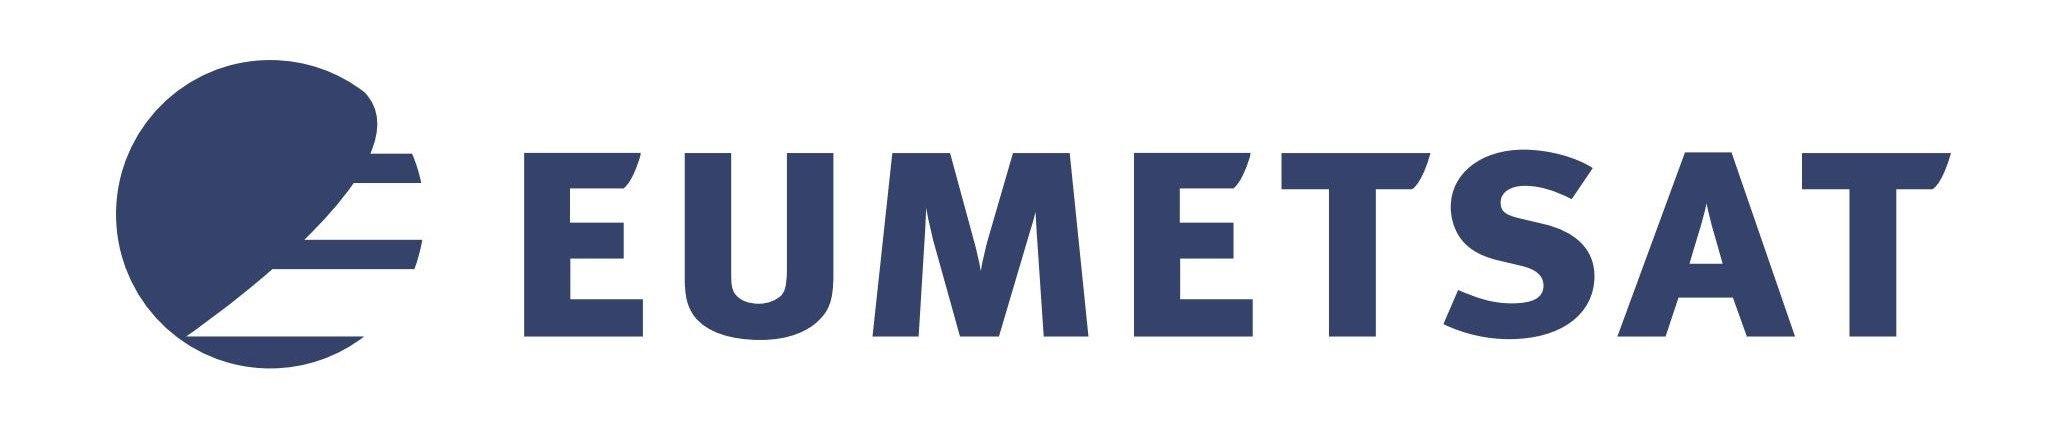 EUMETSAT   European Organisation for the Exploitation of Meteorological Satellites Logo [EPS PDF] png